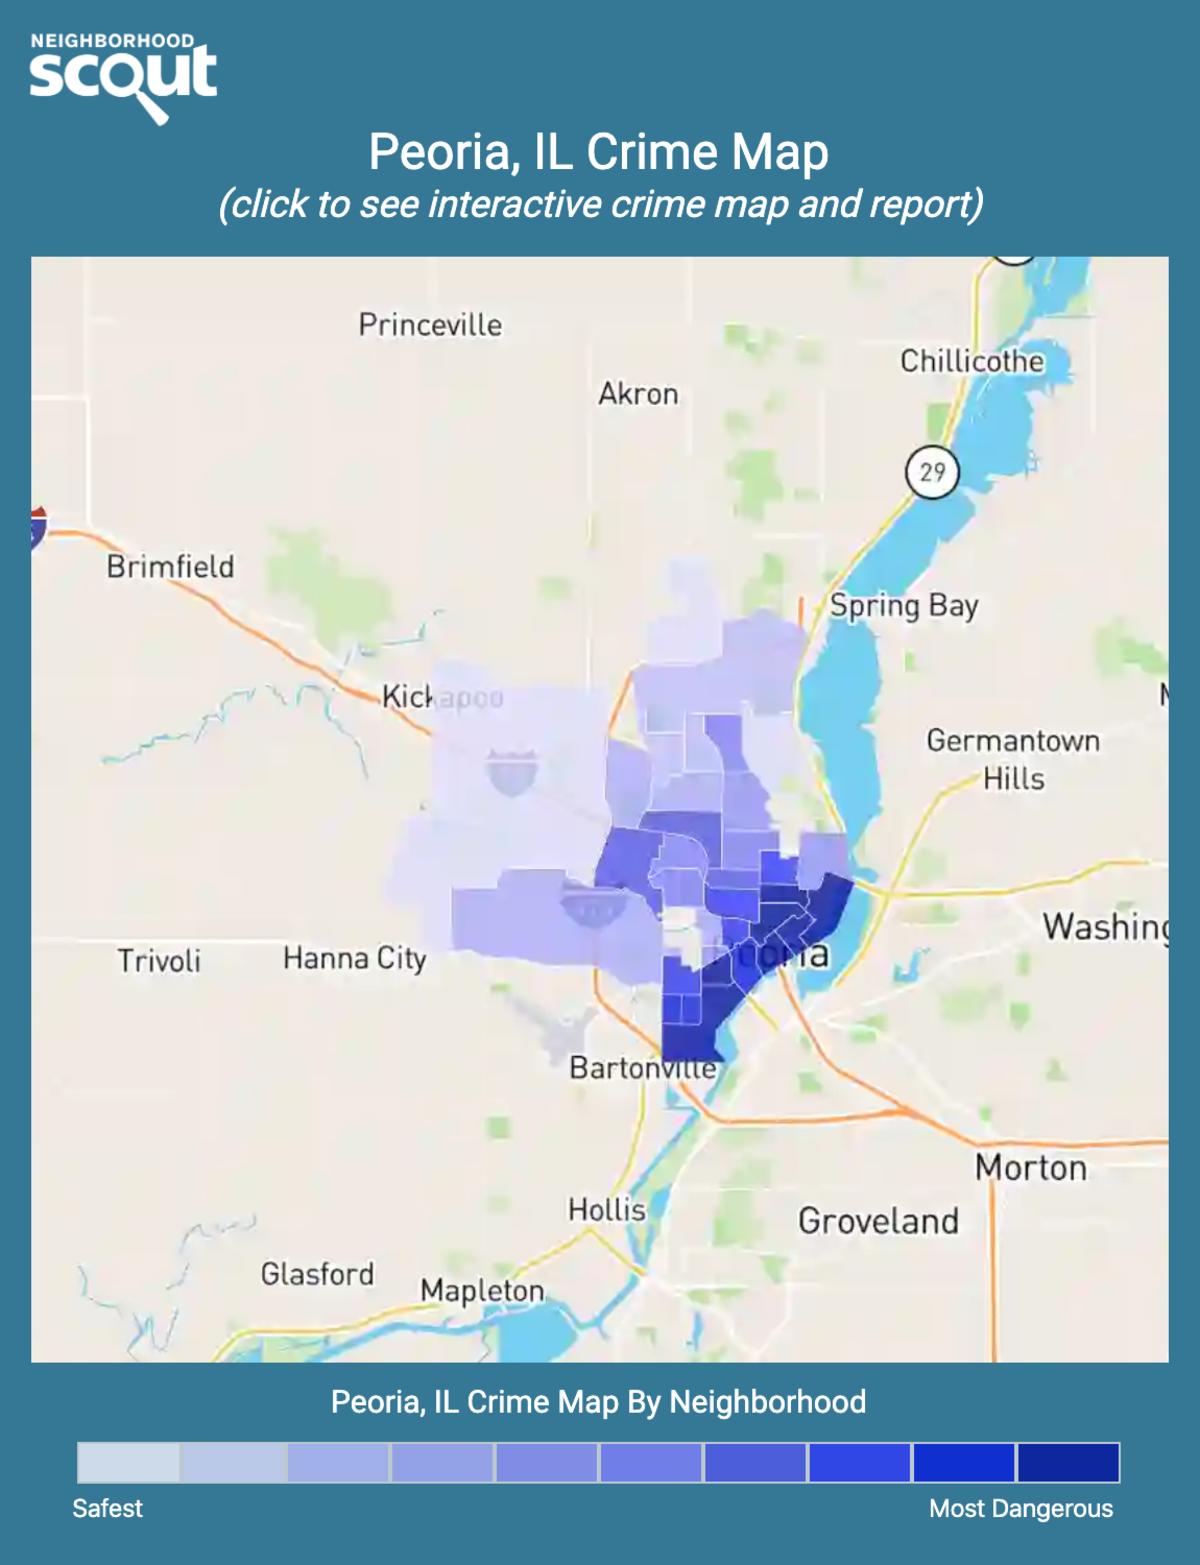 Peoria, Illinois crime map